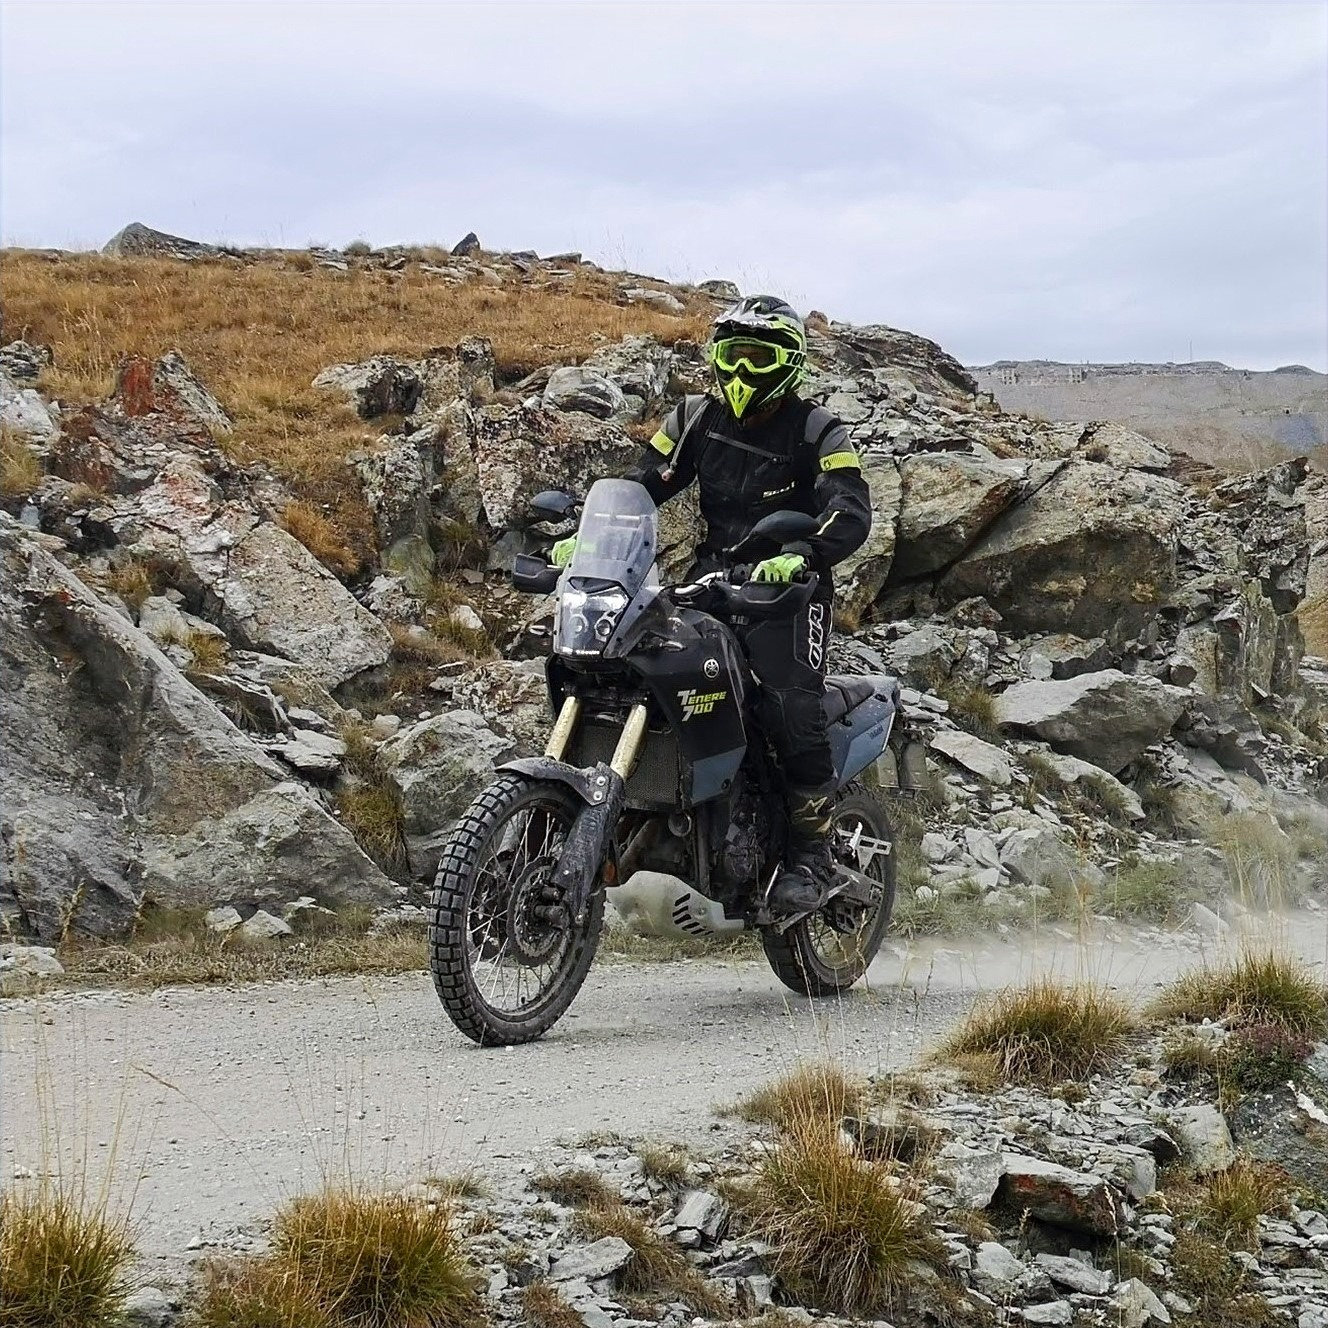 Destination Yamaha Motor - Piemont